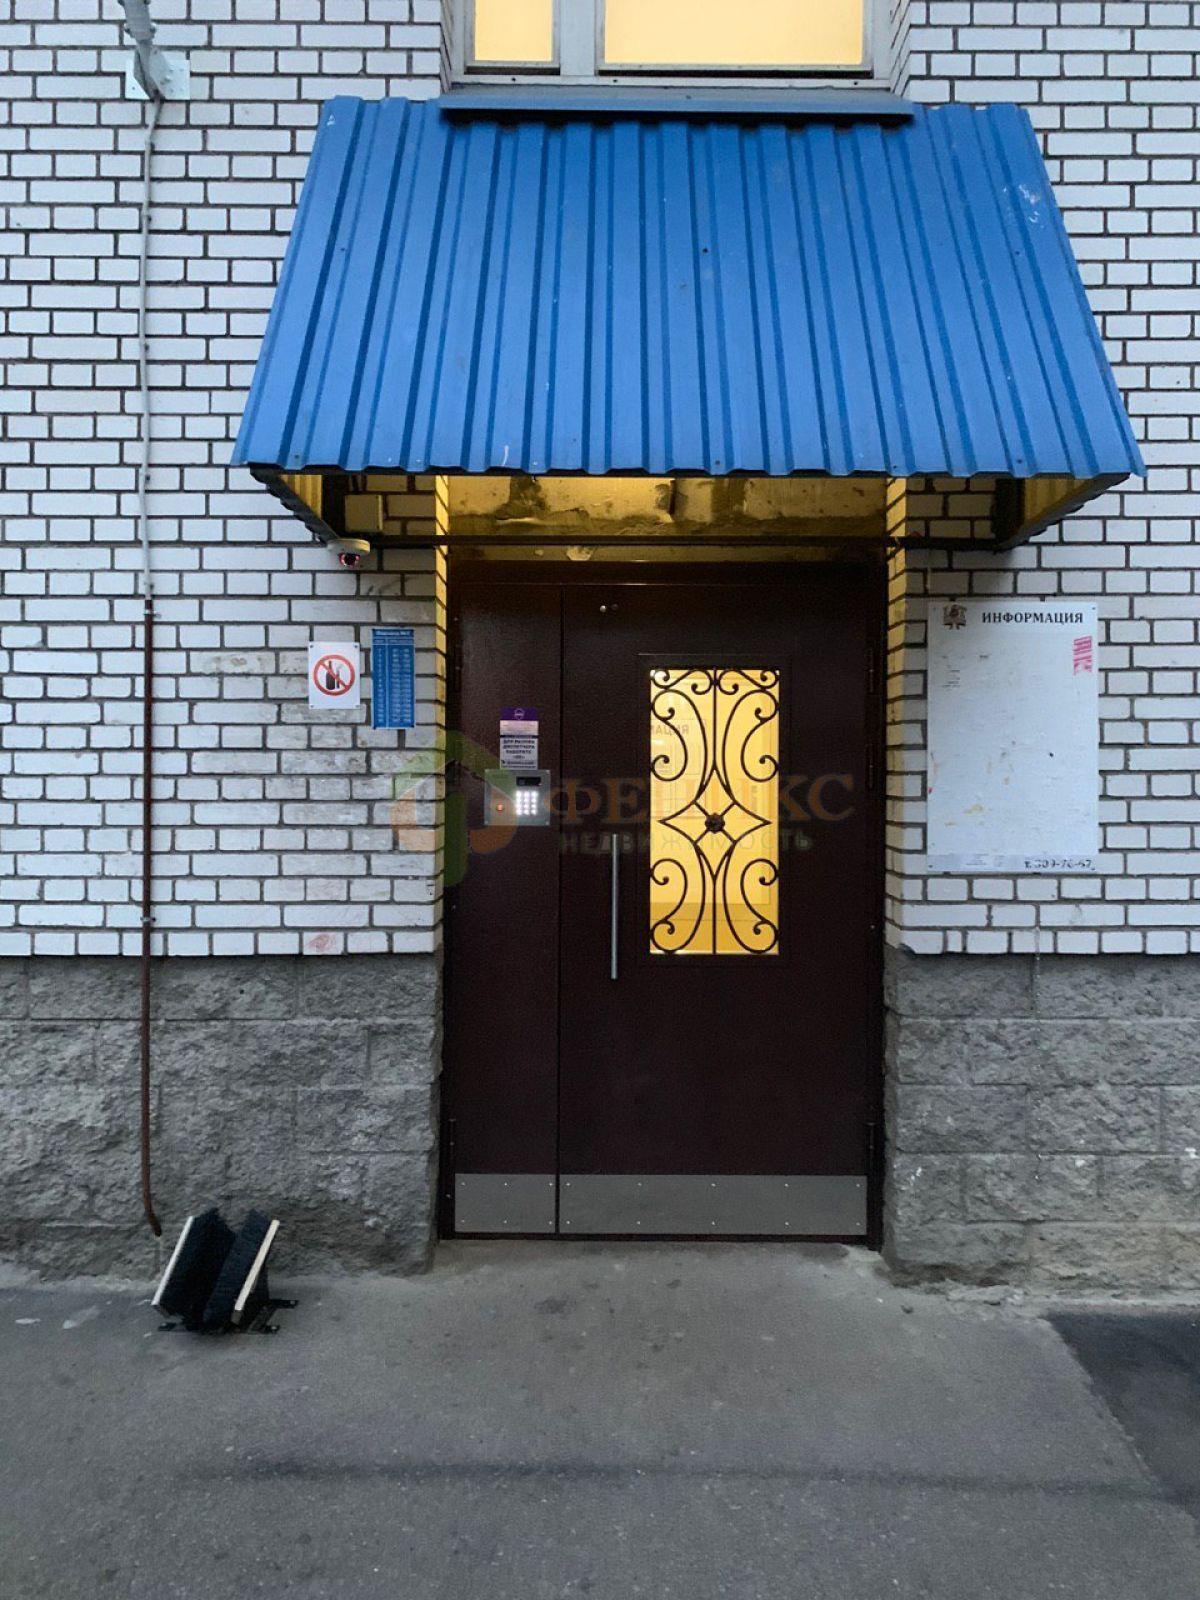 Продам 2-комн. квартиру, Санкт-Петербург, Фрунзенский